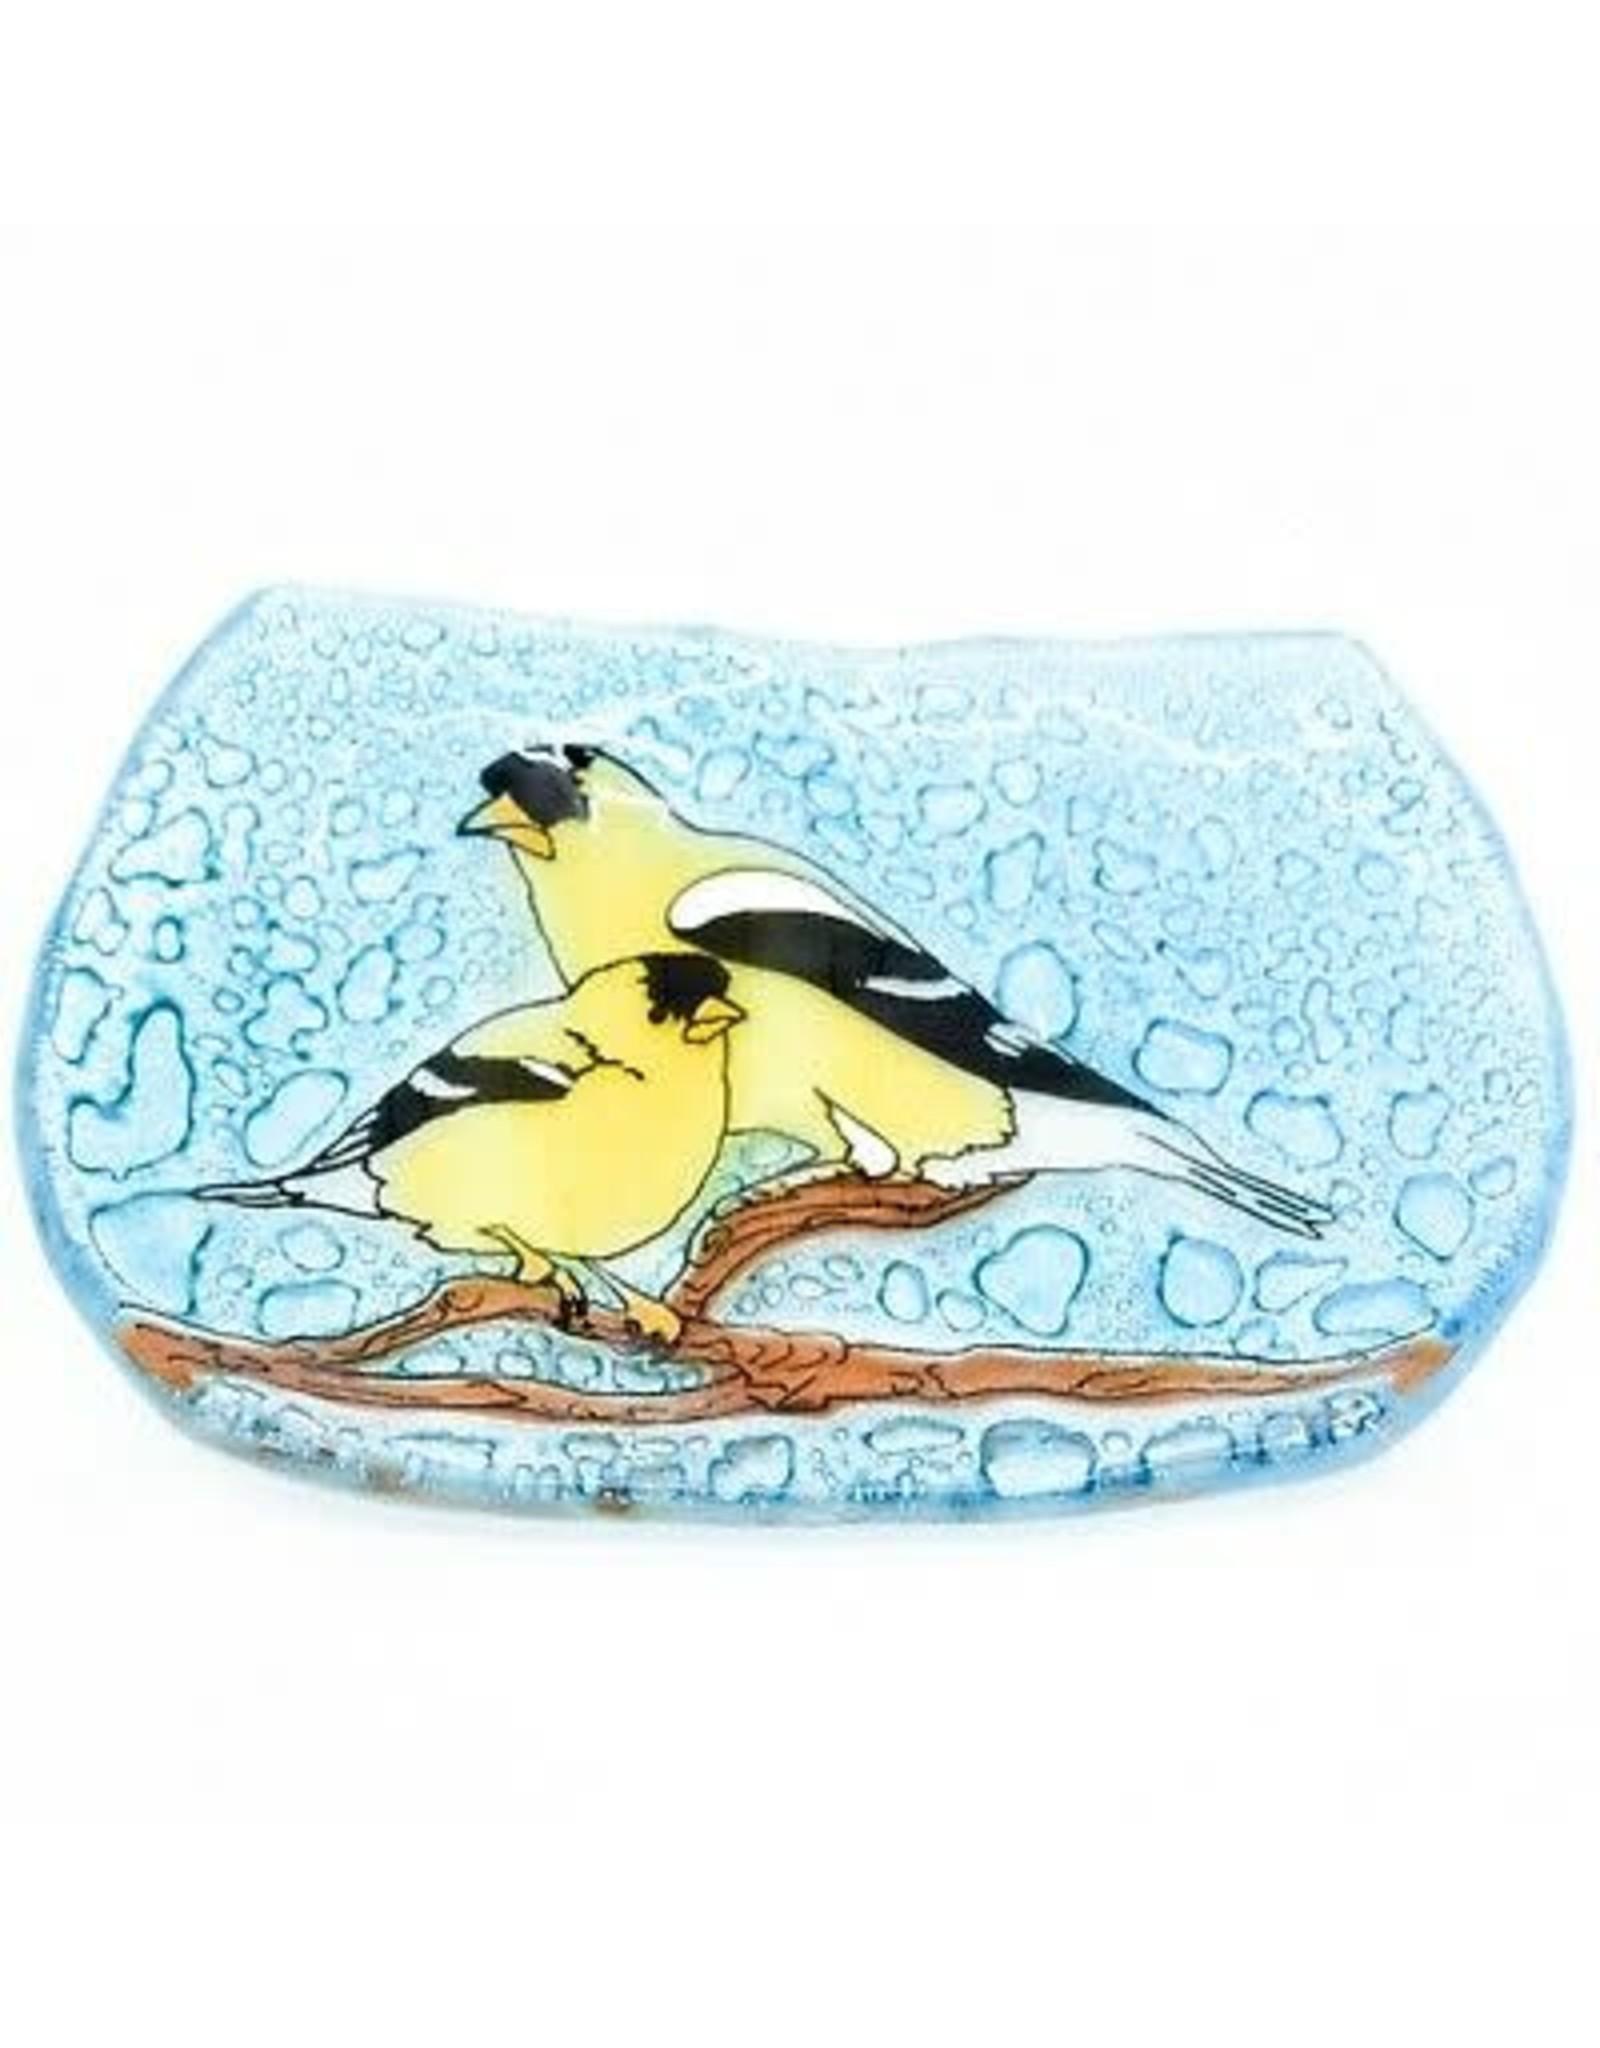 Hand Blown Glass Soap Dish, Goldfinch, Ecuador